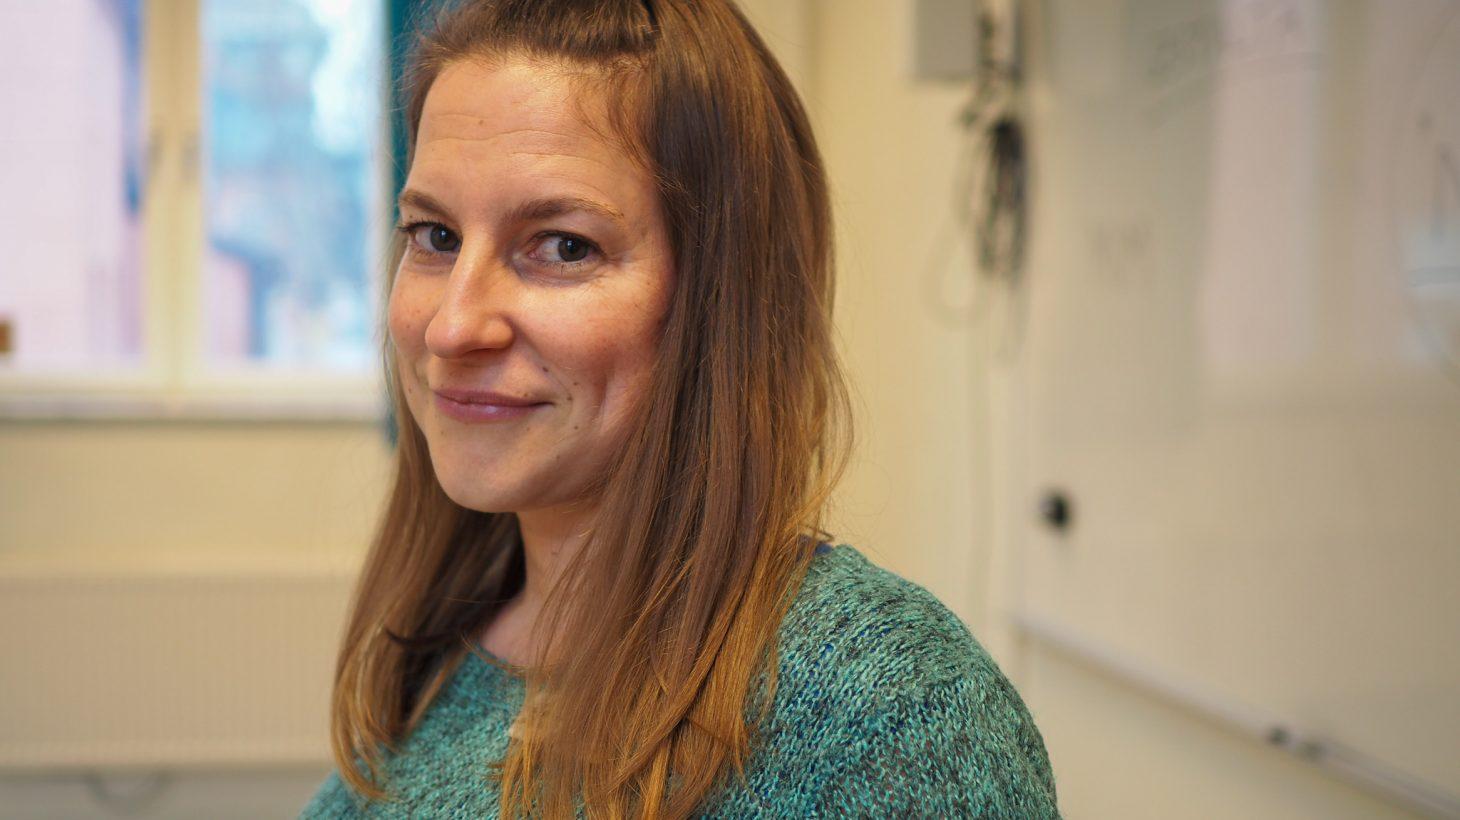 Anja Hortnor dramapedagog står framför whiteboardtavla i klassrum.